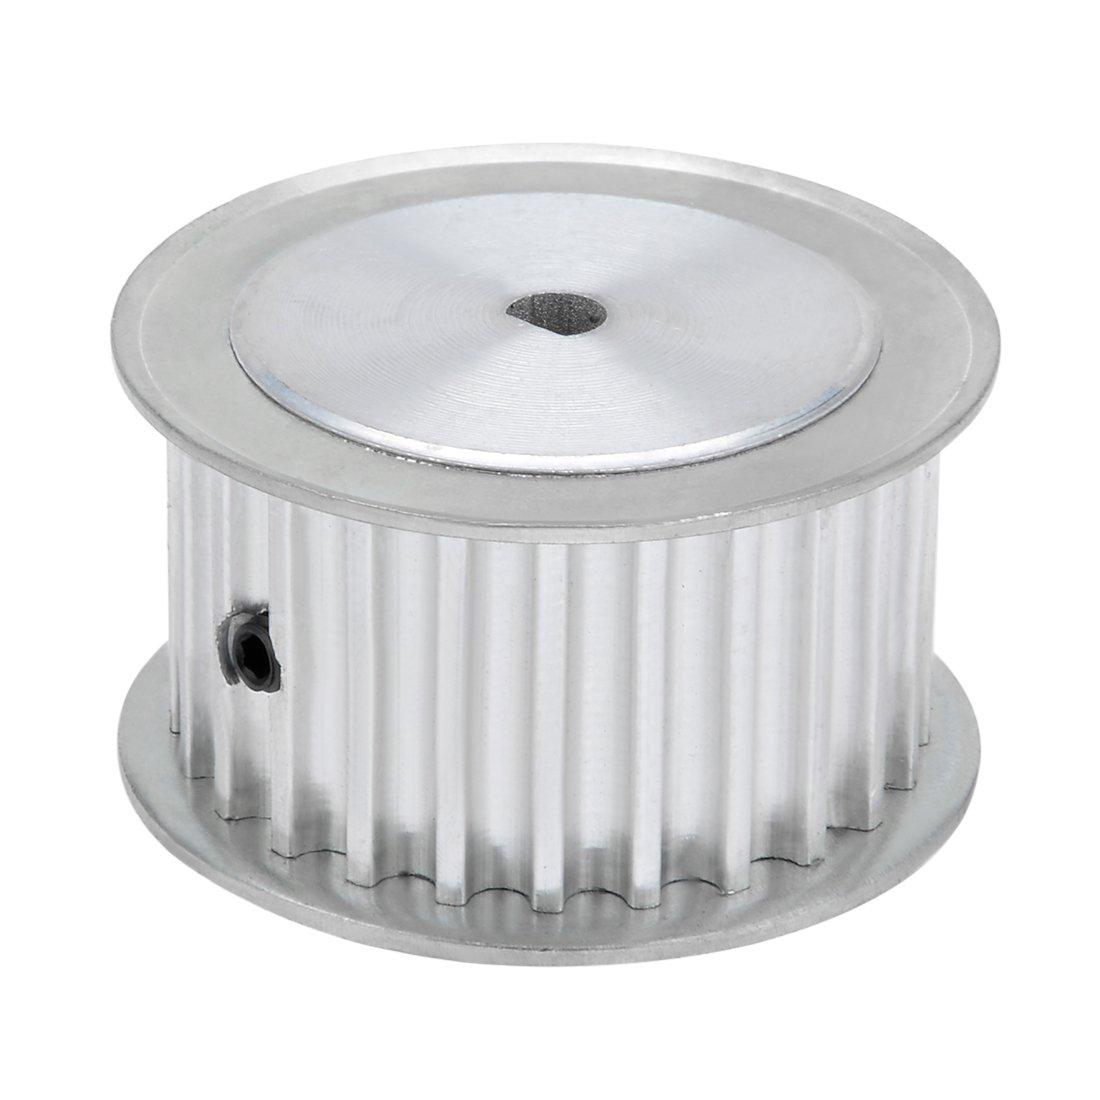 uxcell Aluminum 25 Teeth 5mmx4.5mm D Shape Bore 21mm Belt Timing Idler Pulley Wheel